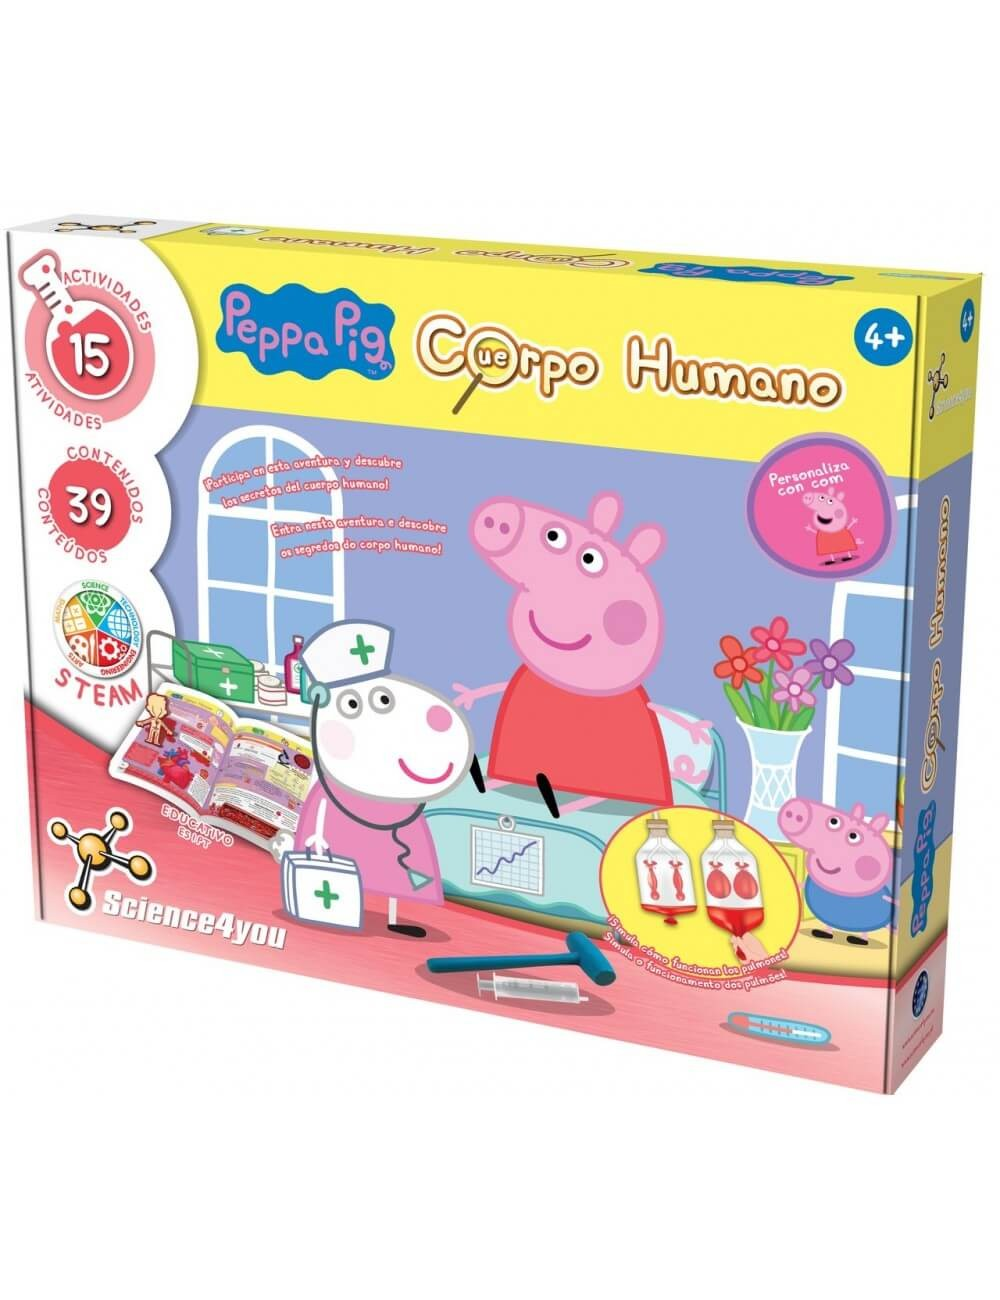 Peppa Pig Corpo Humano